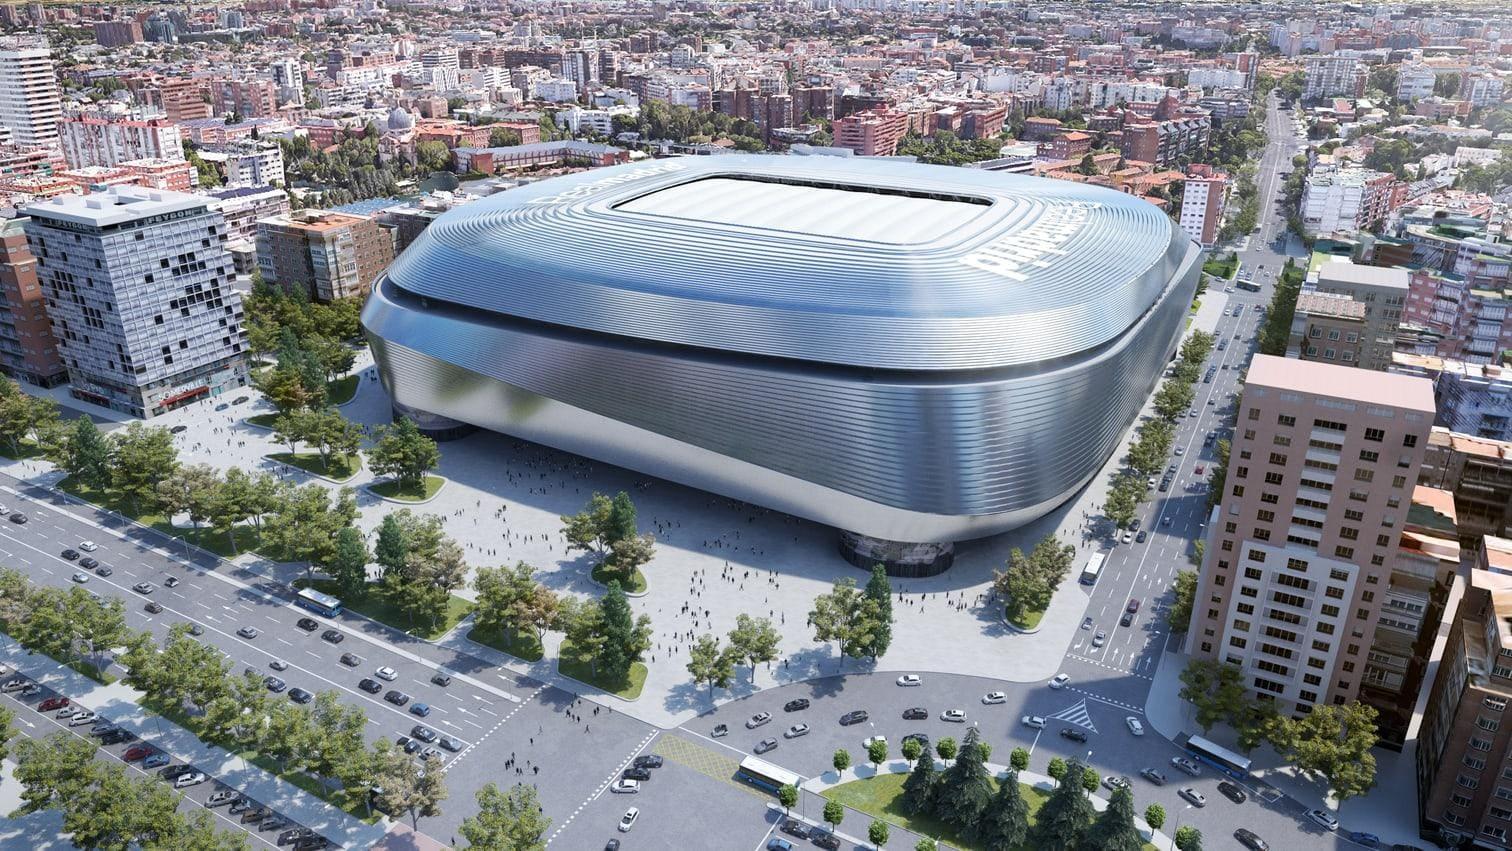 <p>Das große Projekt von Real Madrid: Der Umbau des Estadio Santiago Bernabeu.</p> Foto: Real Madrid C.F.